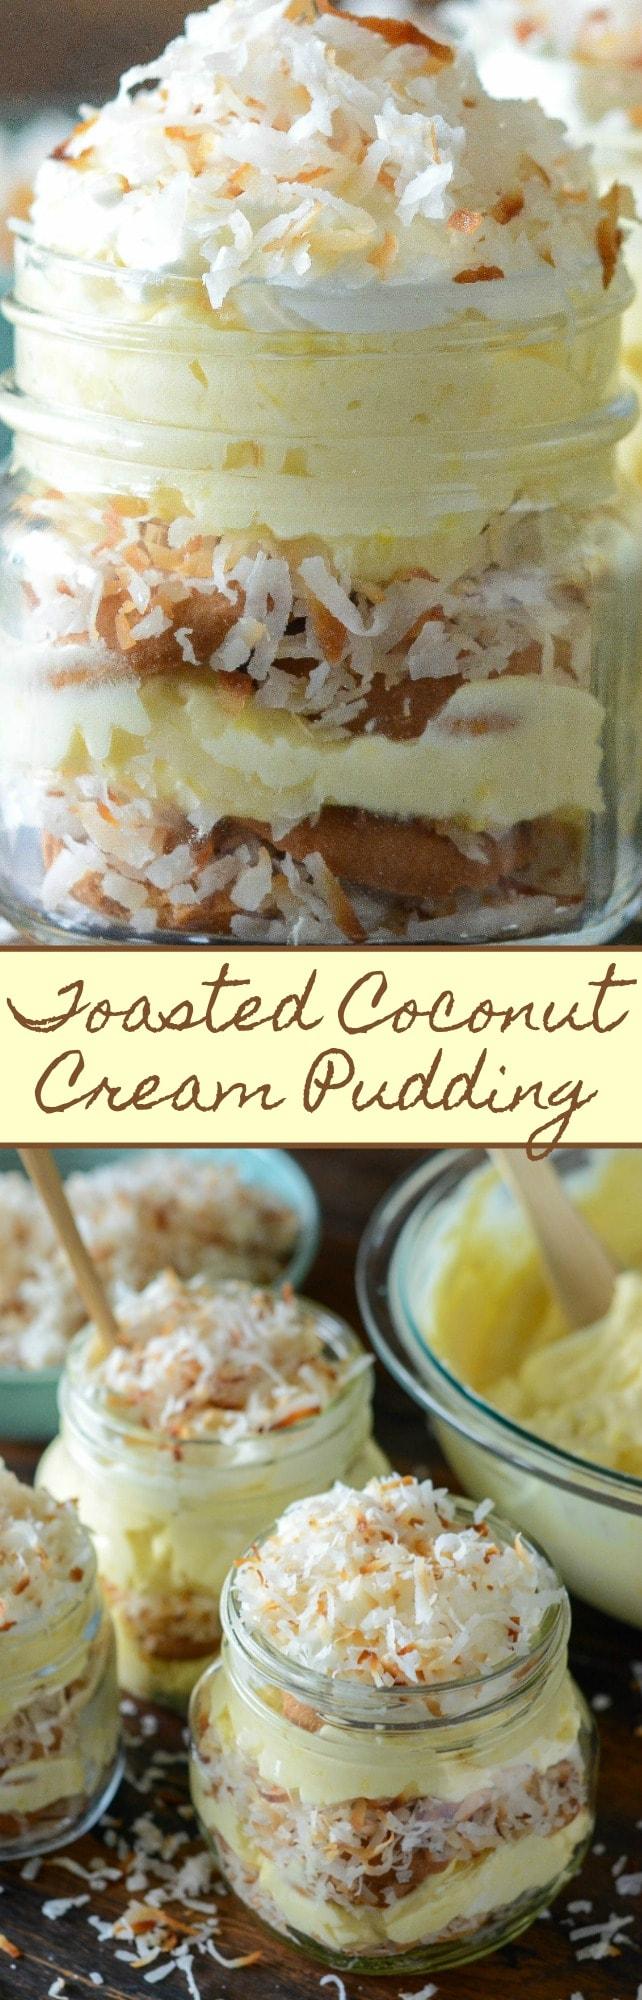 Toasted Coconut Cream Pudding The Novice Chef